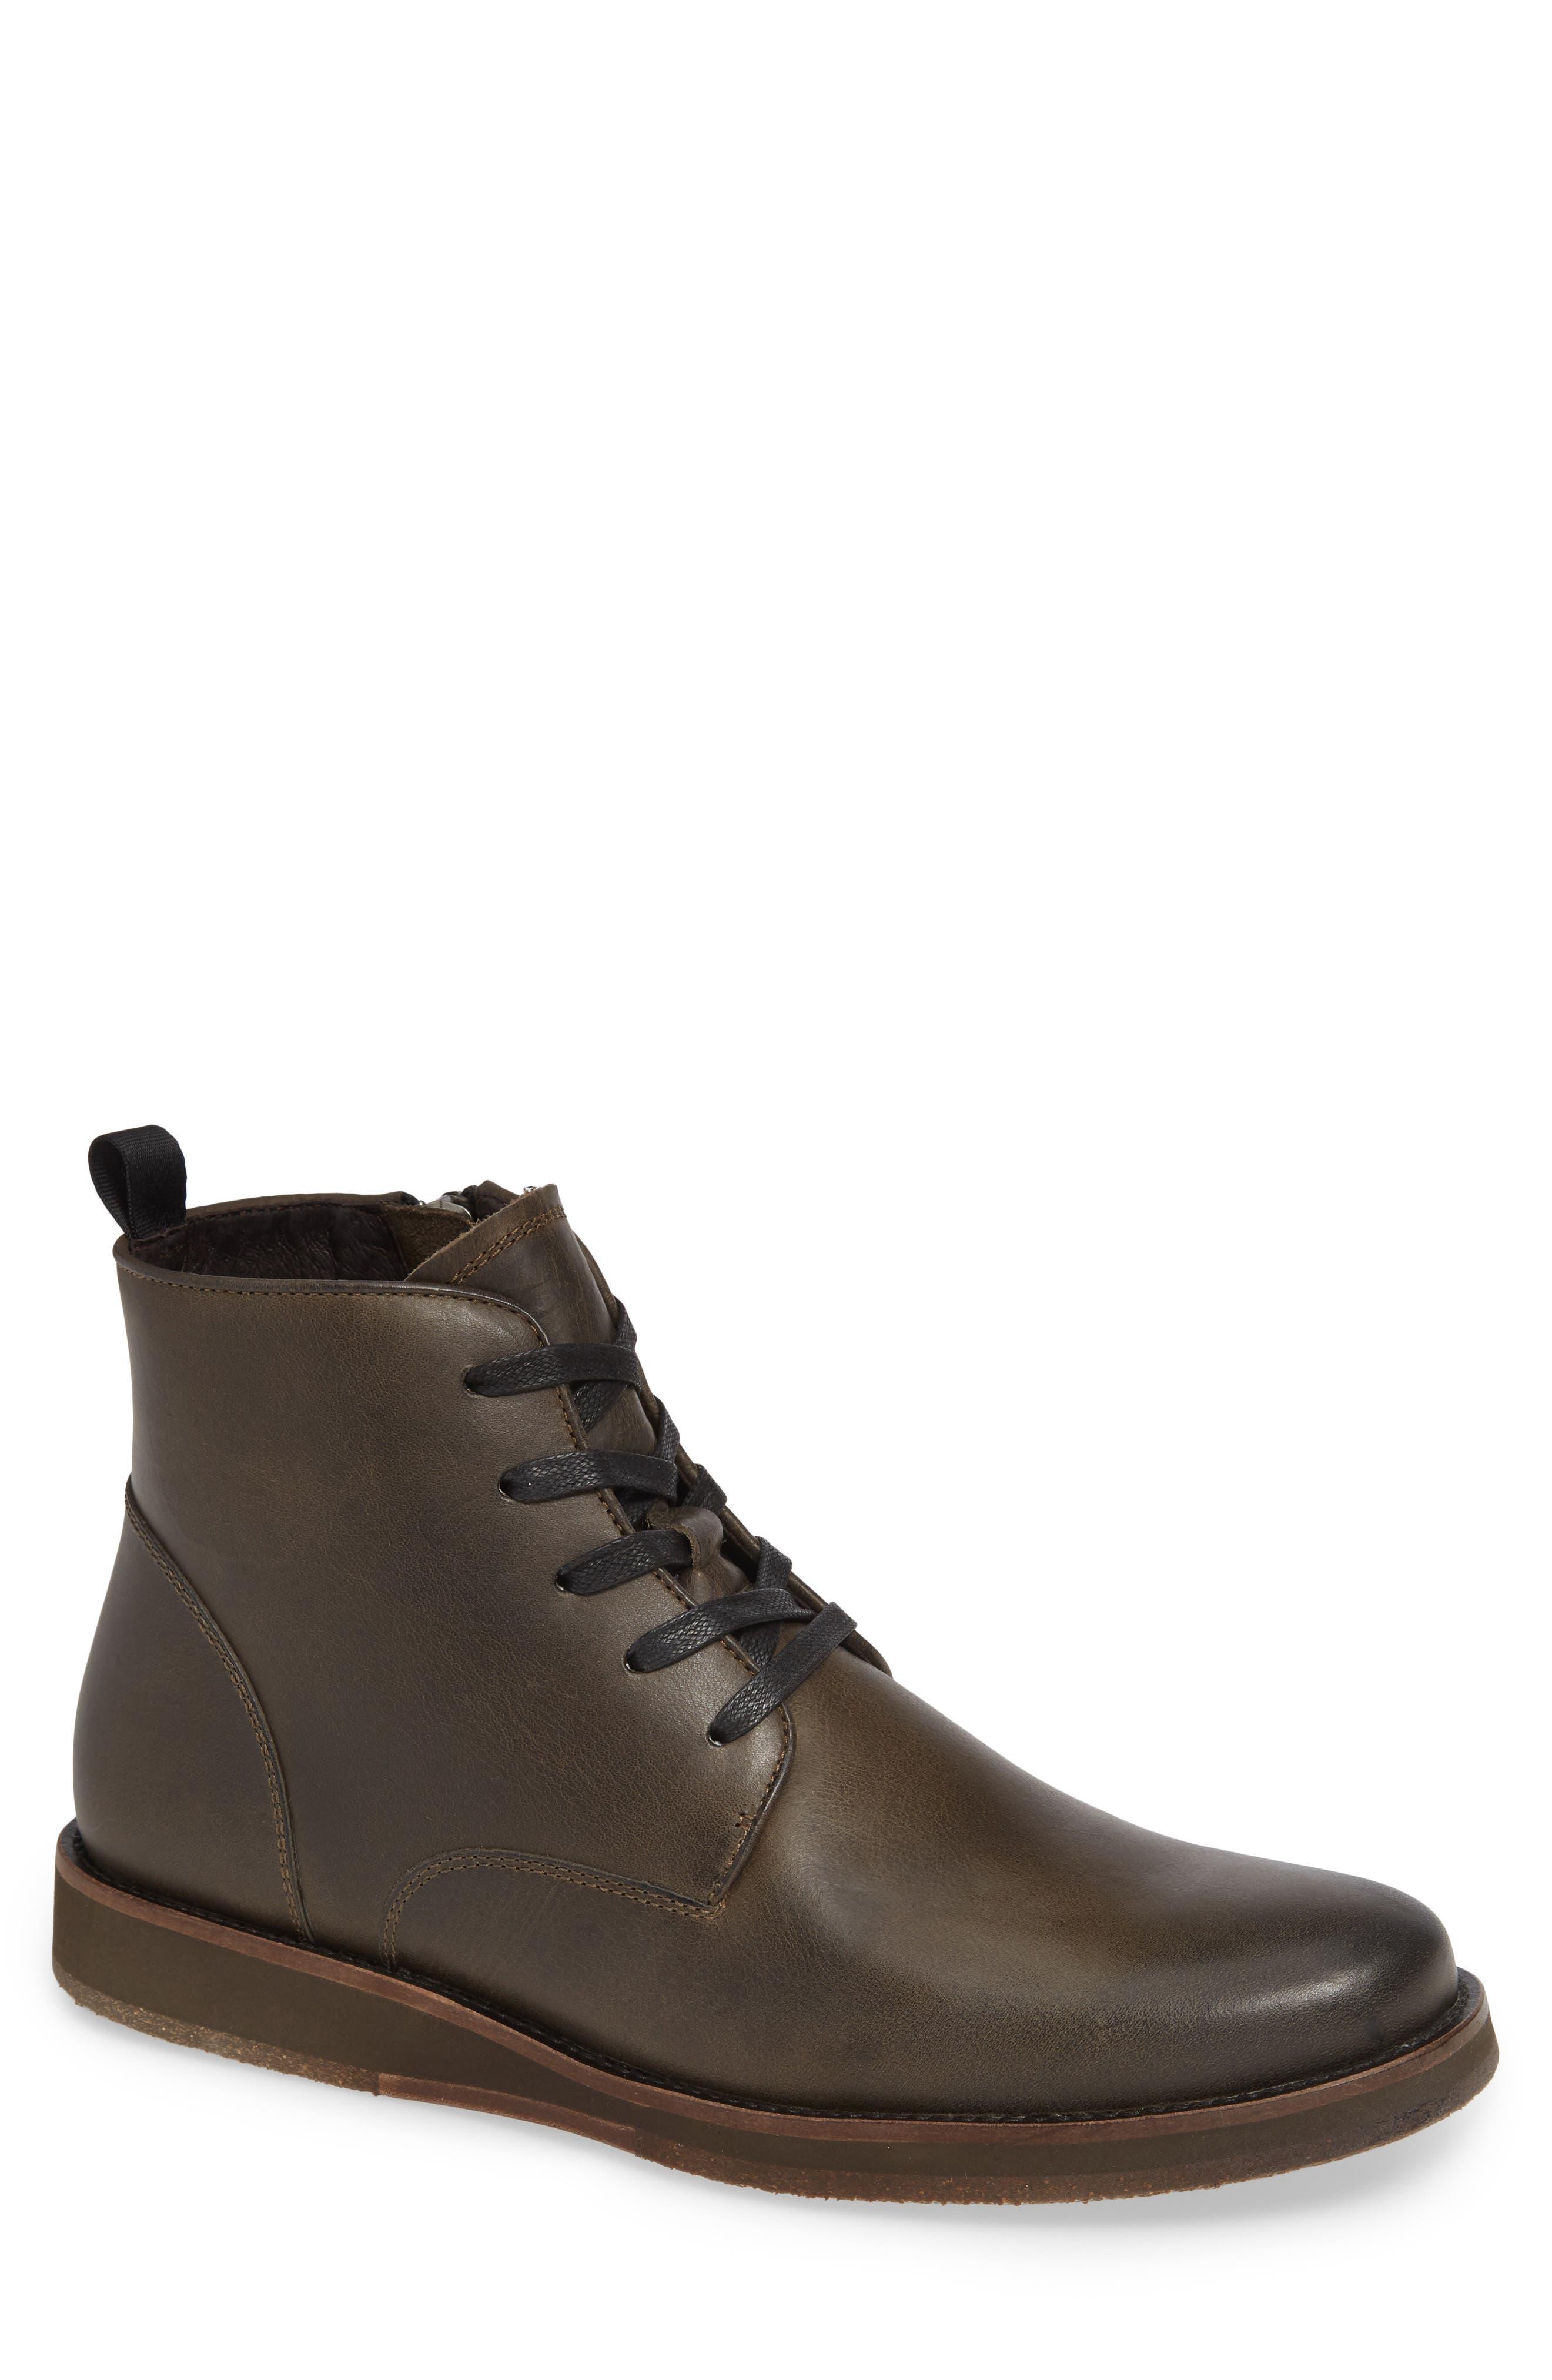 Brooklyn Plain Toe Boot,                             Main thumbnail 1, color,                             BLACK LEATHER